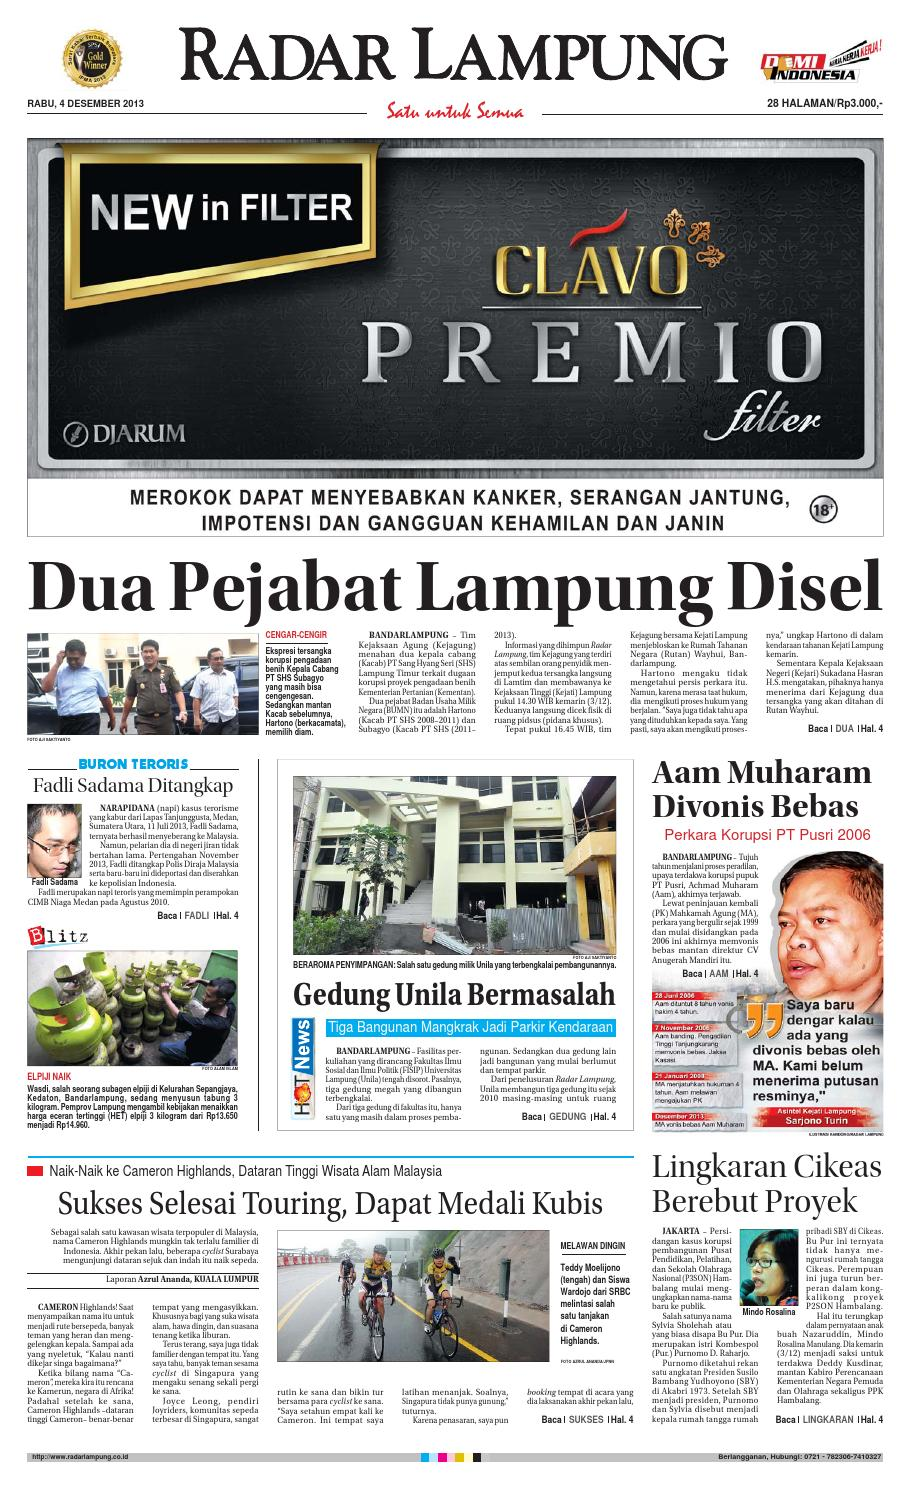 Radar Lampung Rabu 4 Desember 2013 By Ayep Kancee Issuu Produk Ukm Bumn Tas Ransel Threepoint